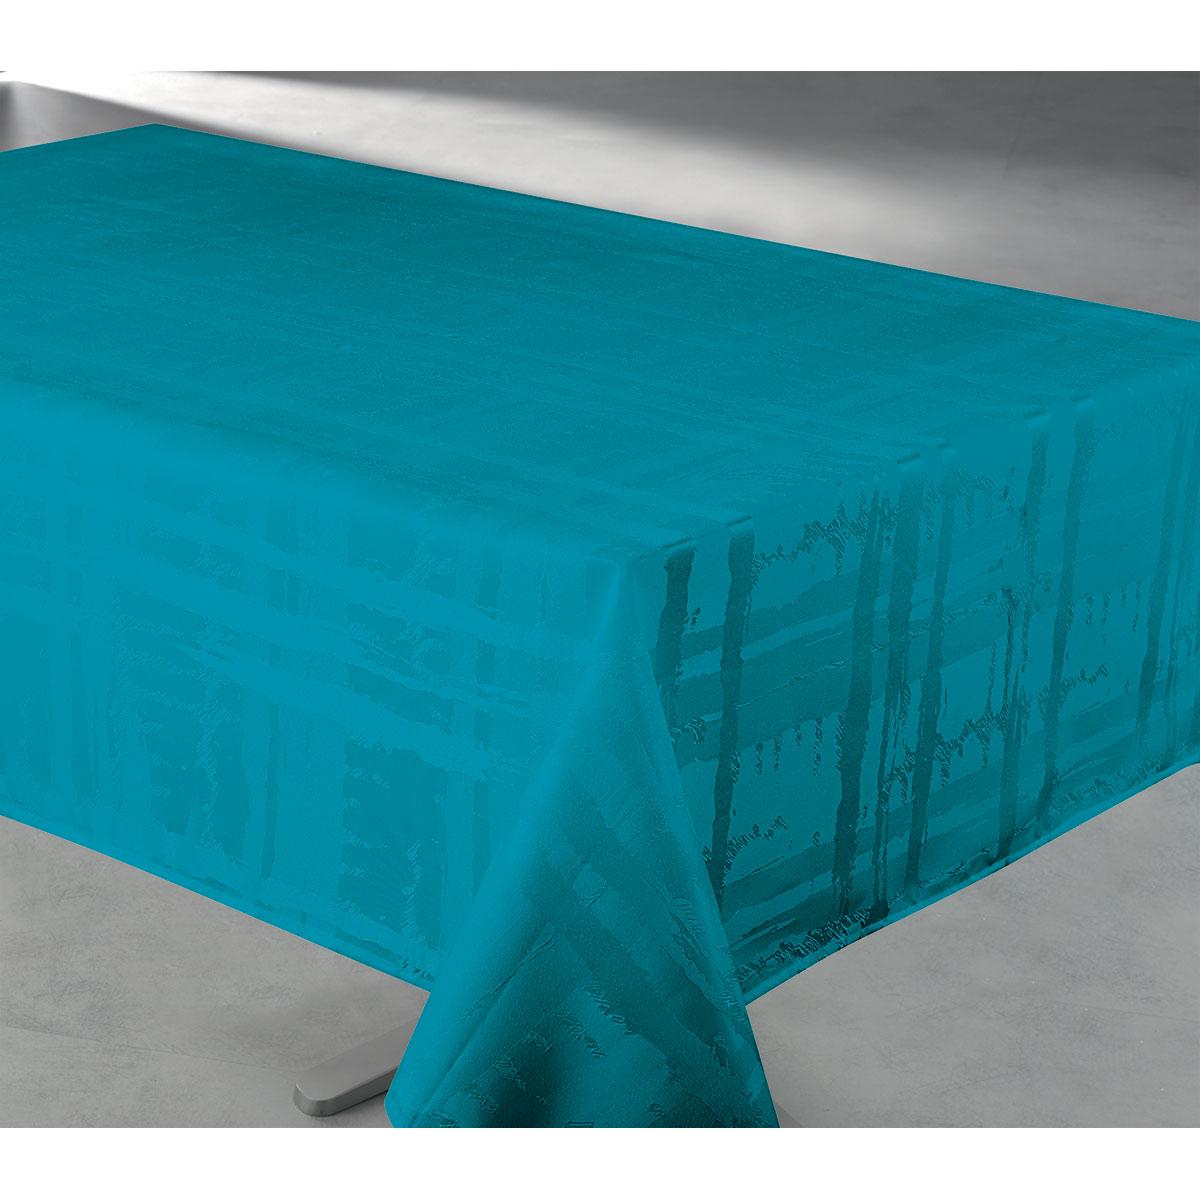 Nappe en tissu jacquard anti tache - Bleu Turquoise - 145 x 240 cm